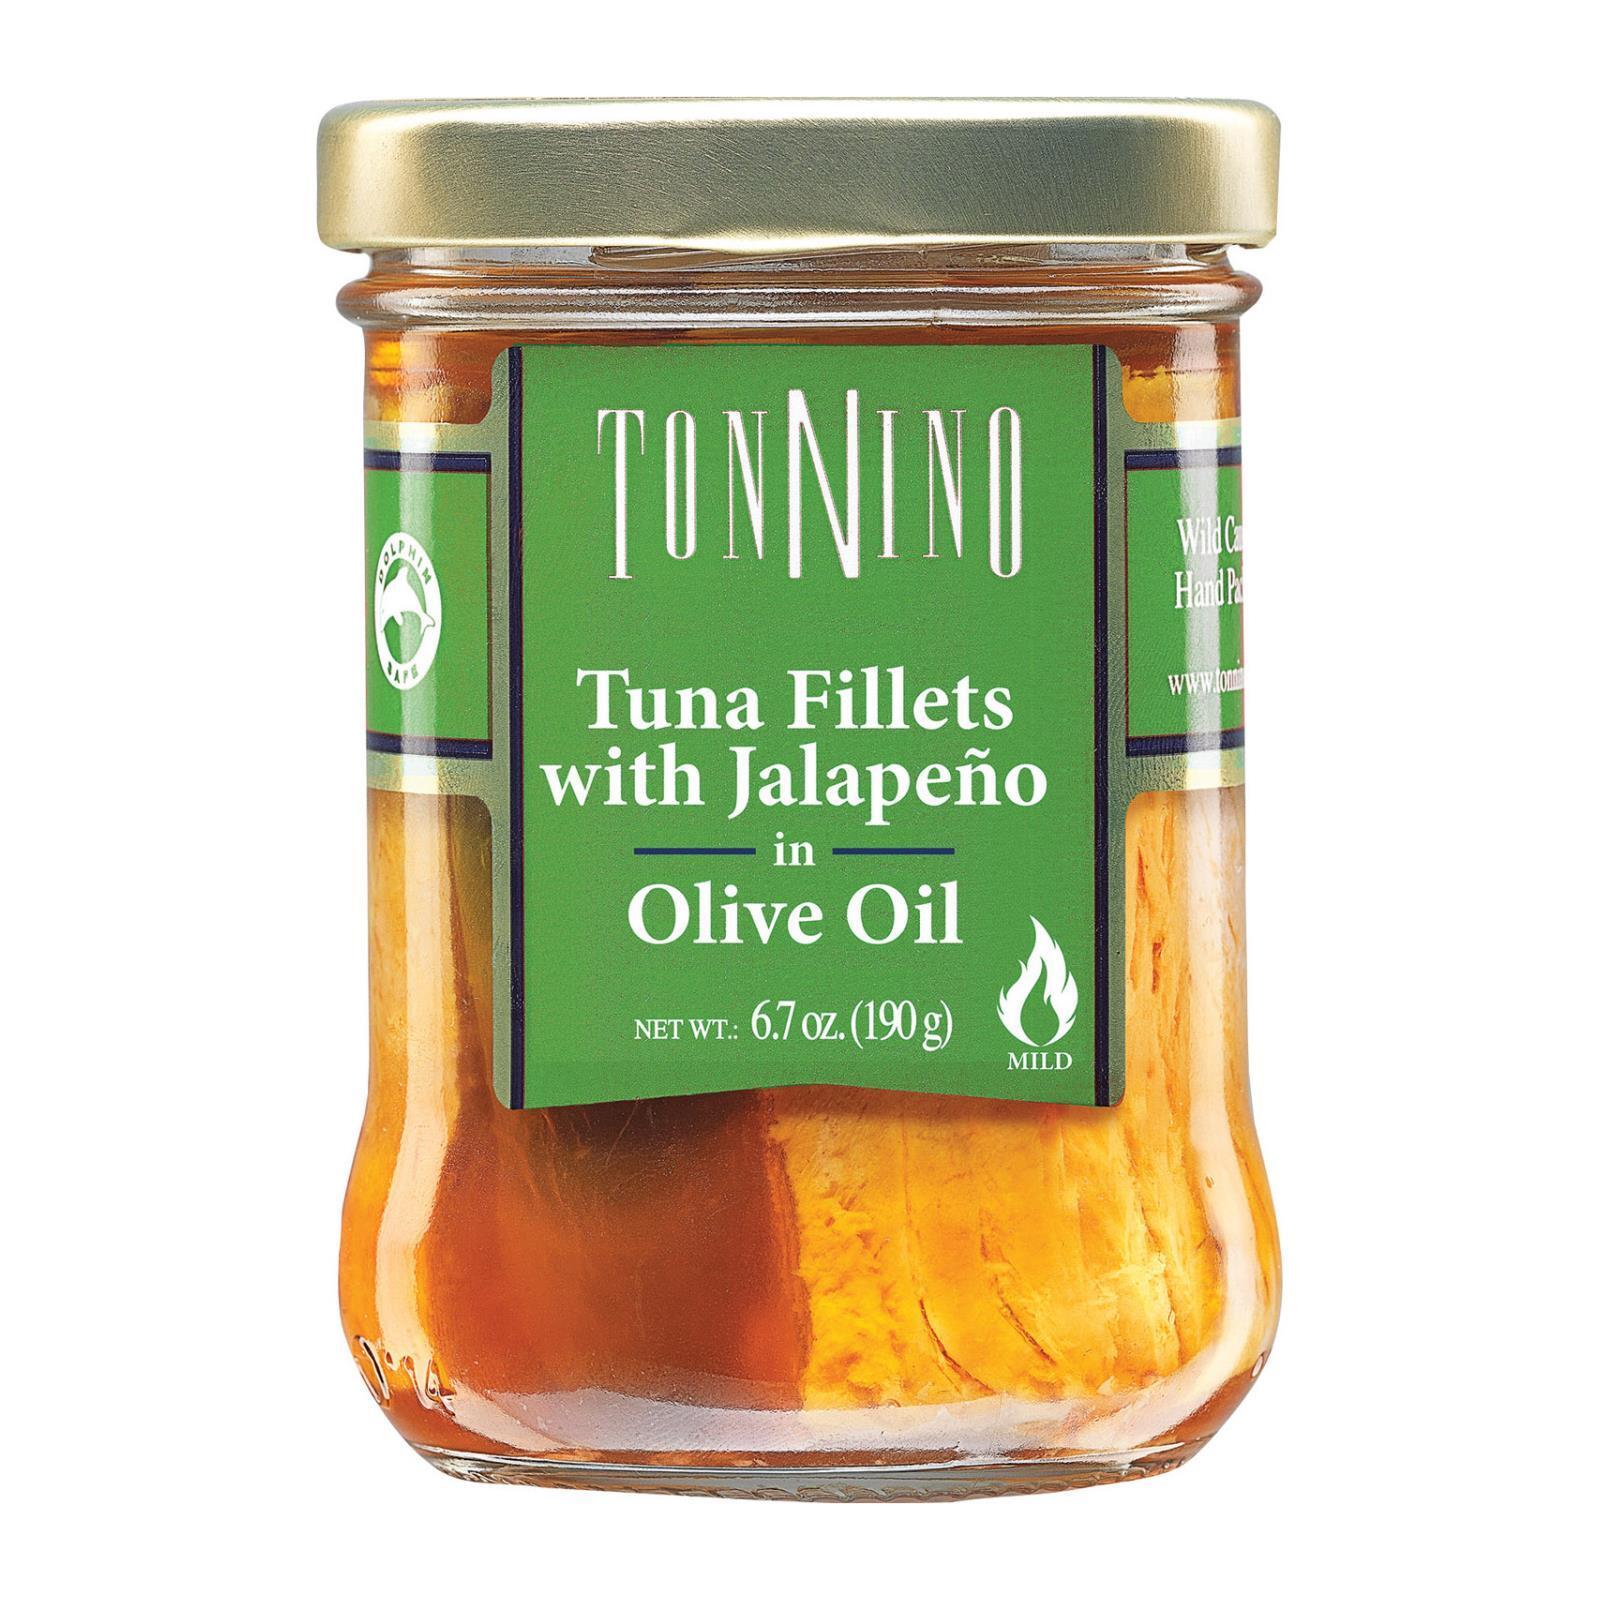 Tonnino Tuna Fillets - Jalapeno, Olive Oil - Case of 6 - 6.7 oz.